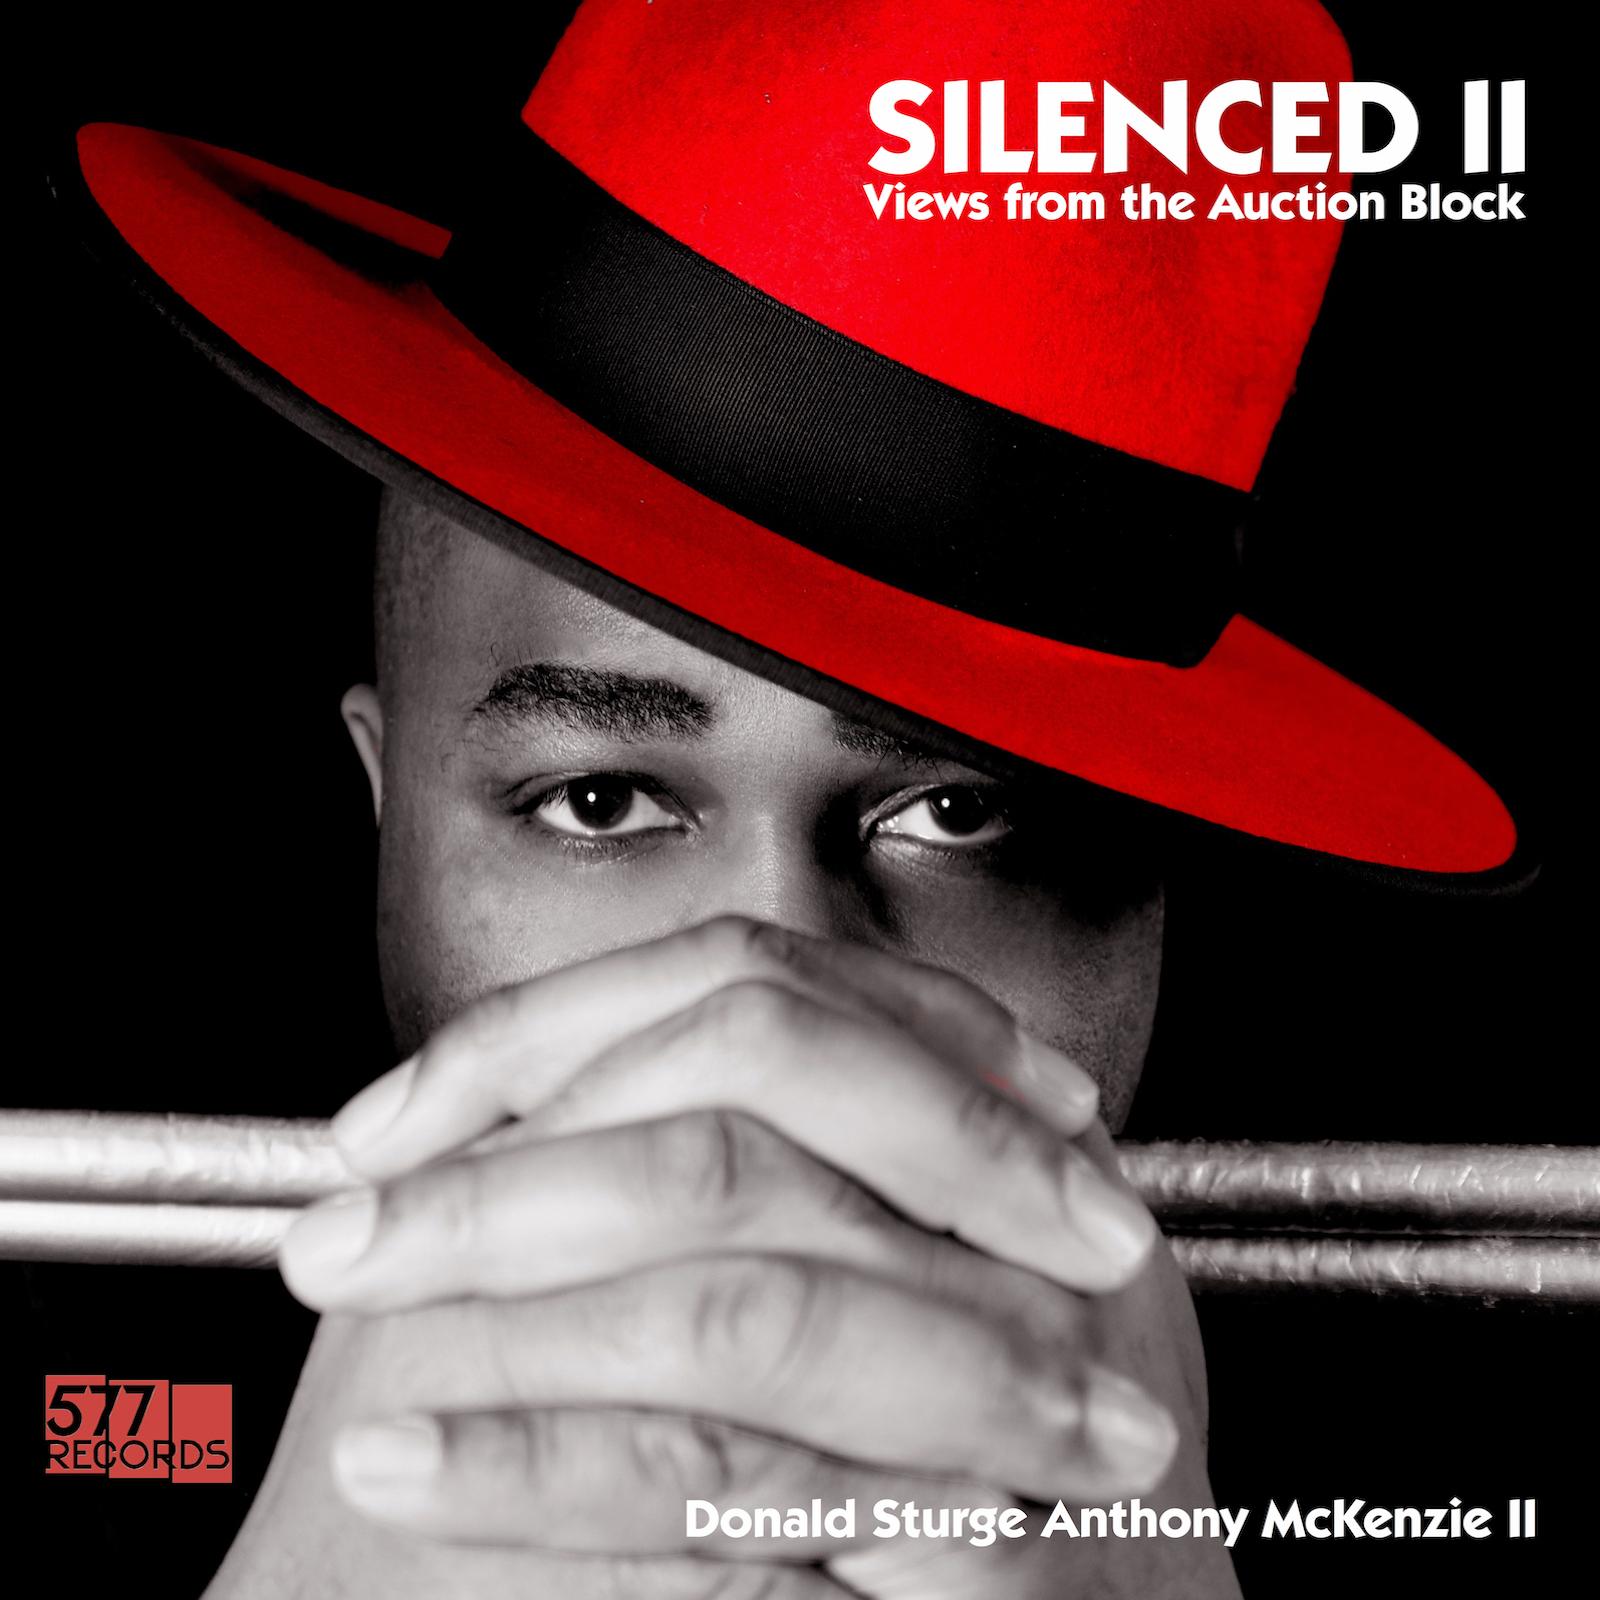 DONALD STURGE ANTHONY McKENZIE II SILENCED II feat. ELLIOTT SHARP. VERNON REID & BILL LASWELL